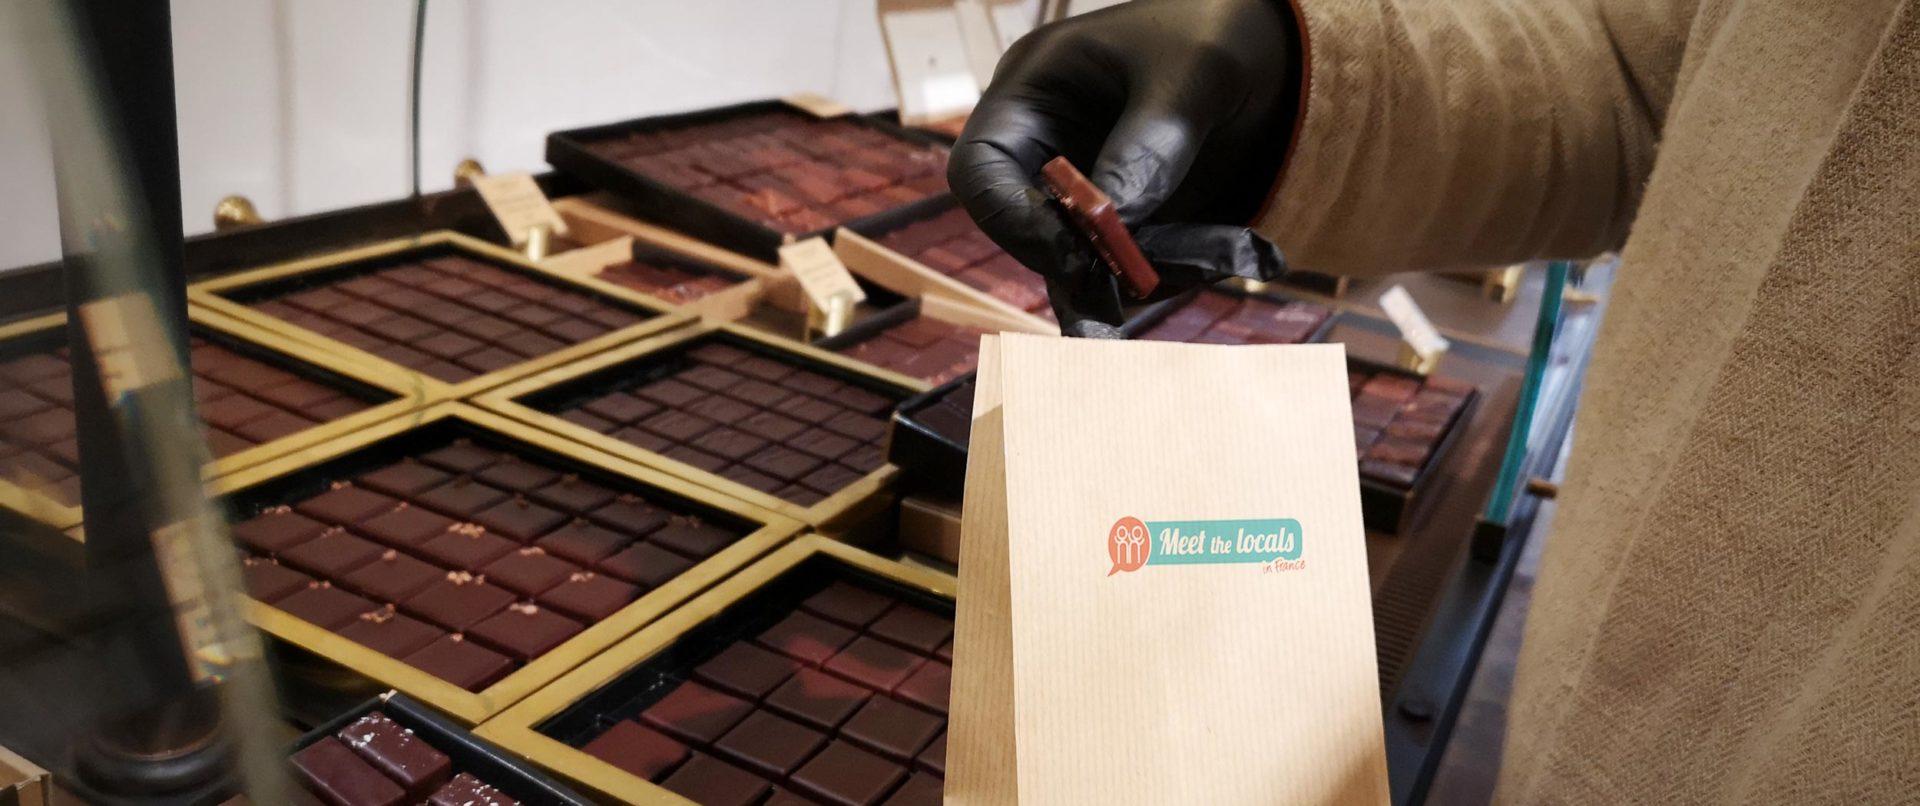 family-walking-tour-paris-chocolate